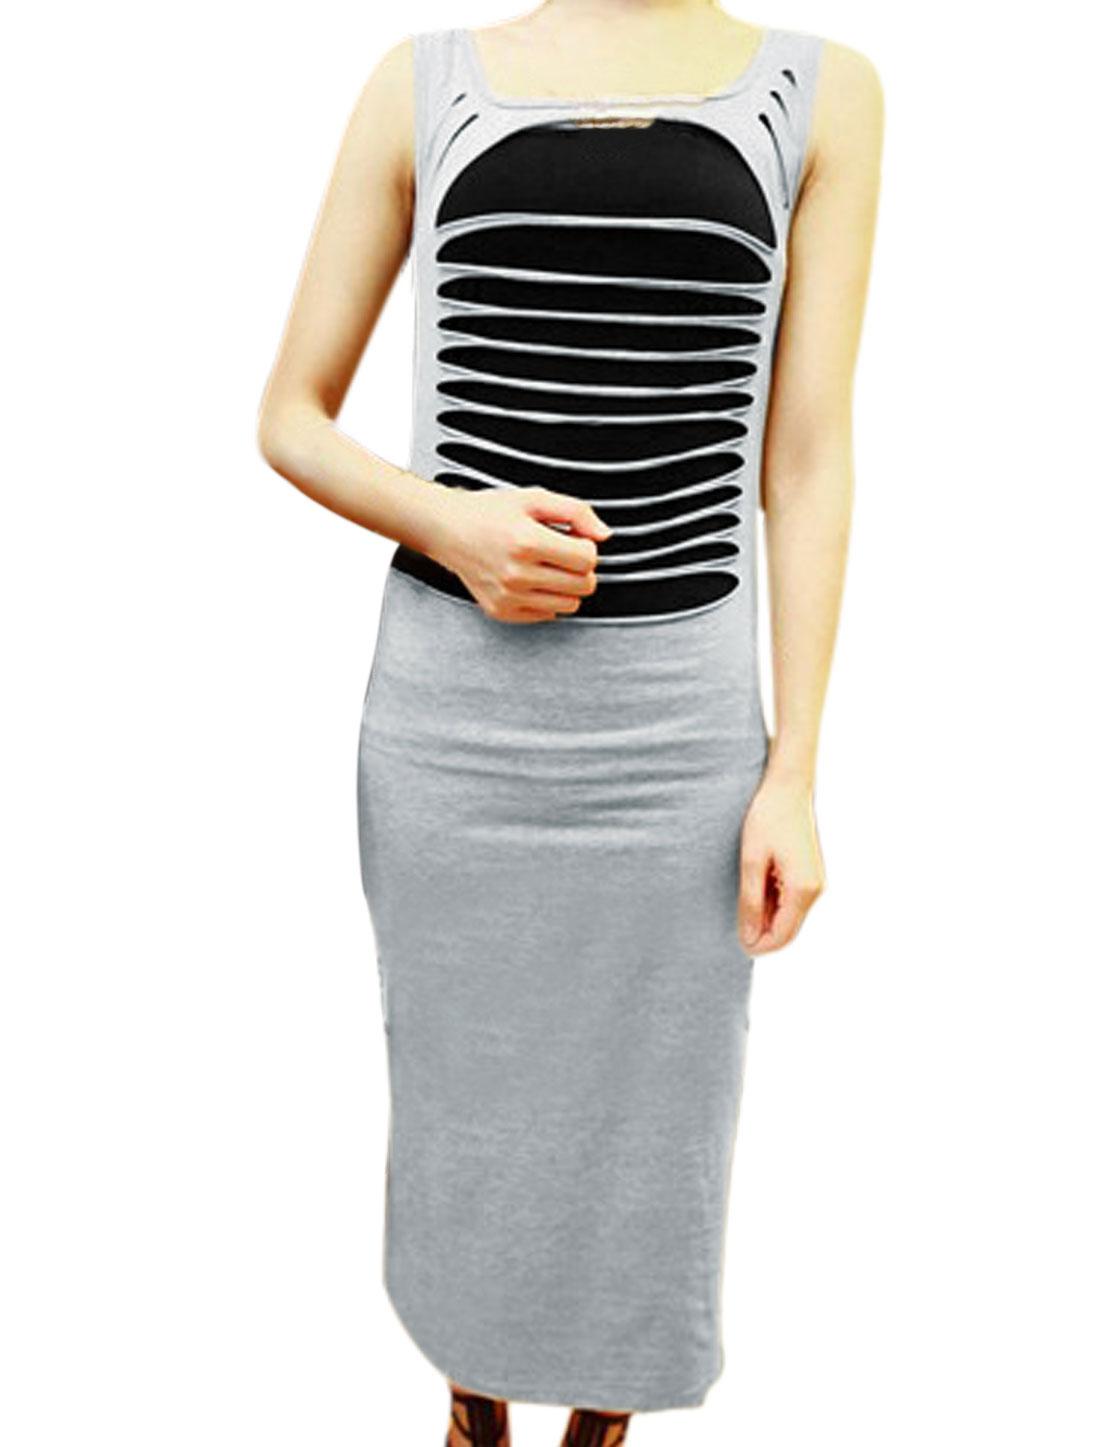 Lady Cut Out Light Gray Sheath Dress w Spaghetti Strap Black Cami XS